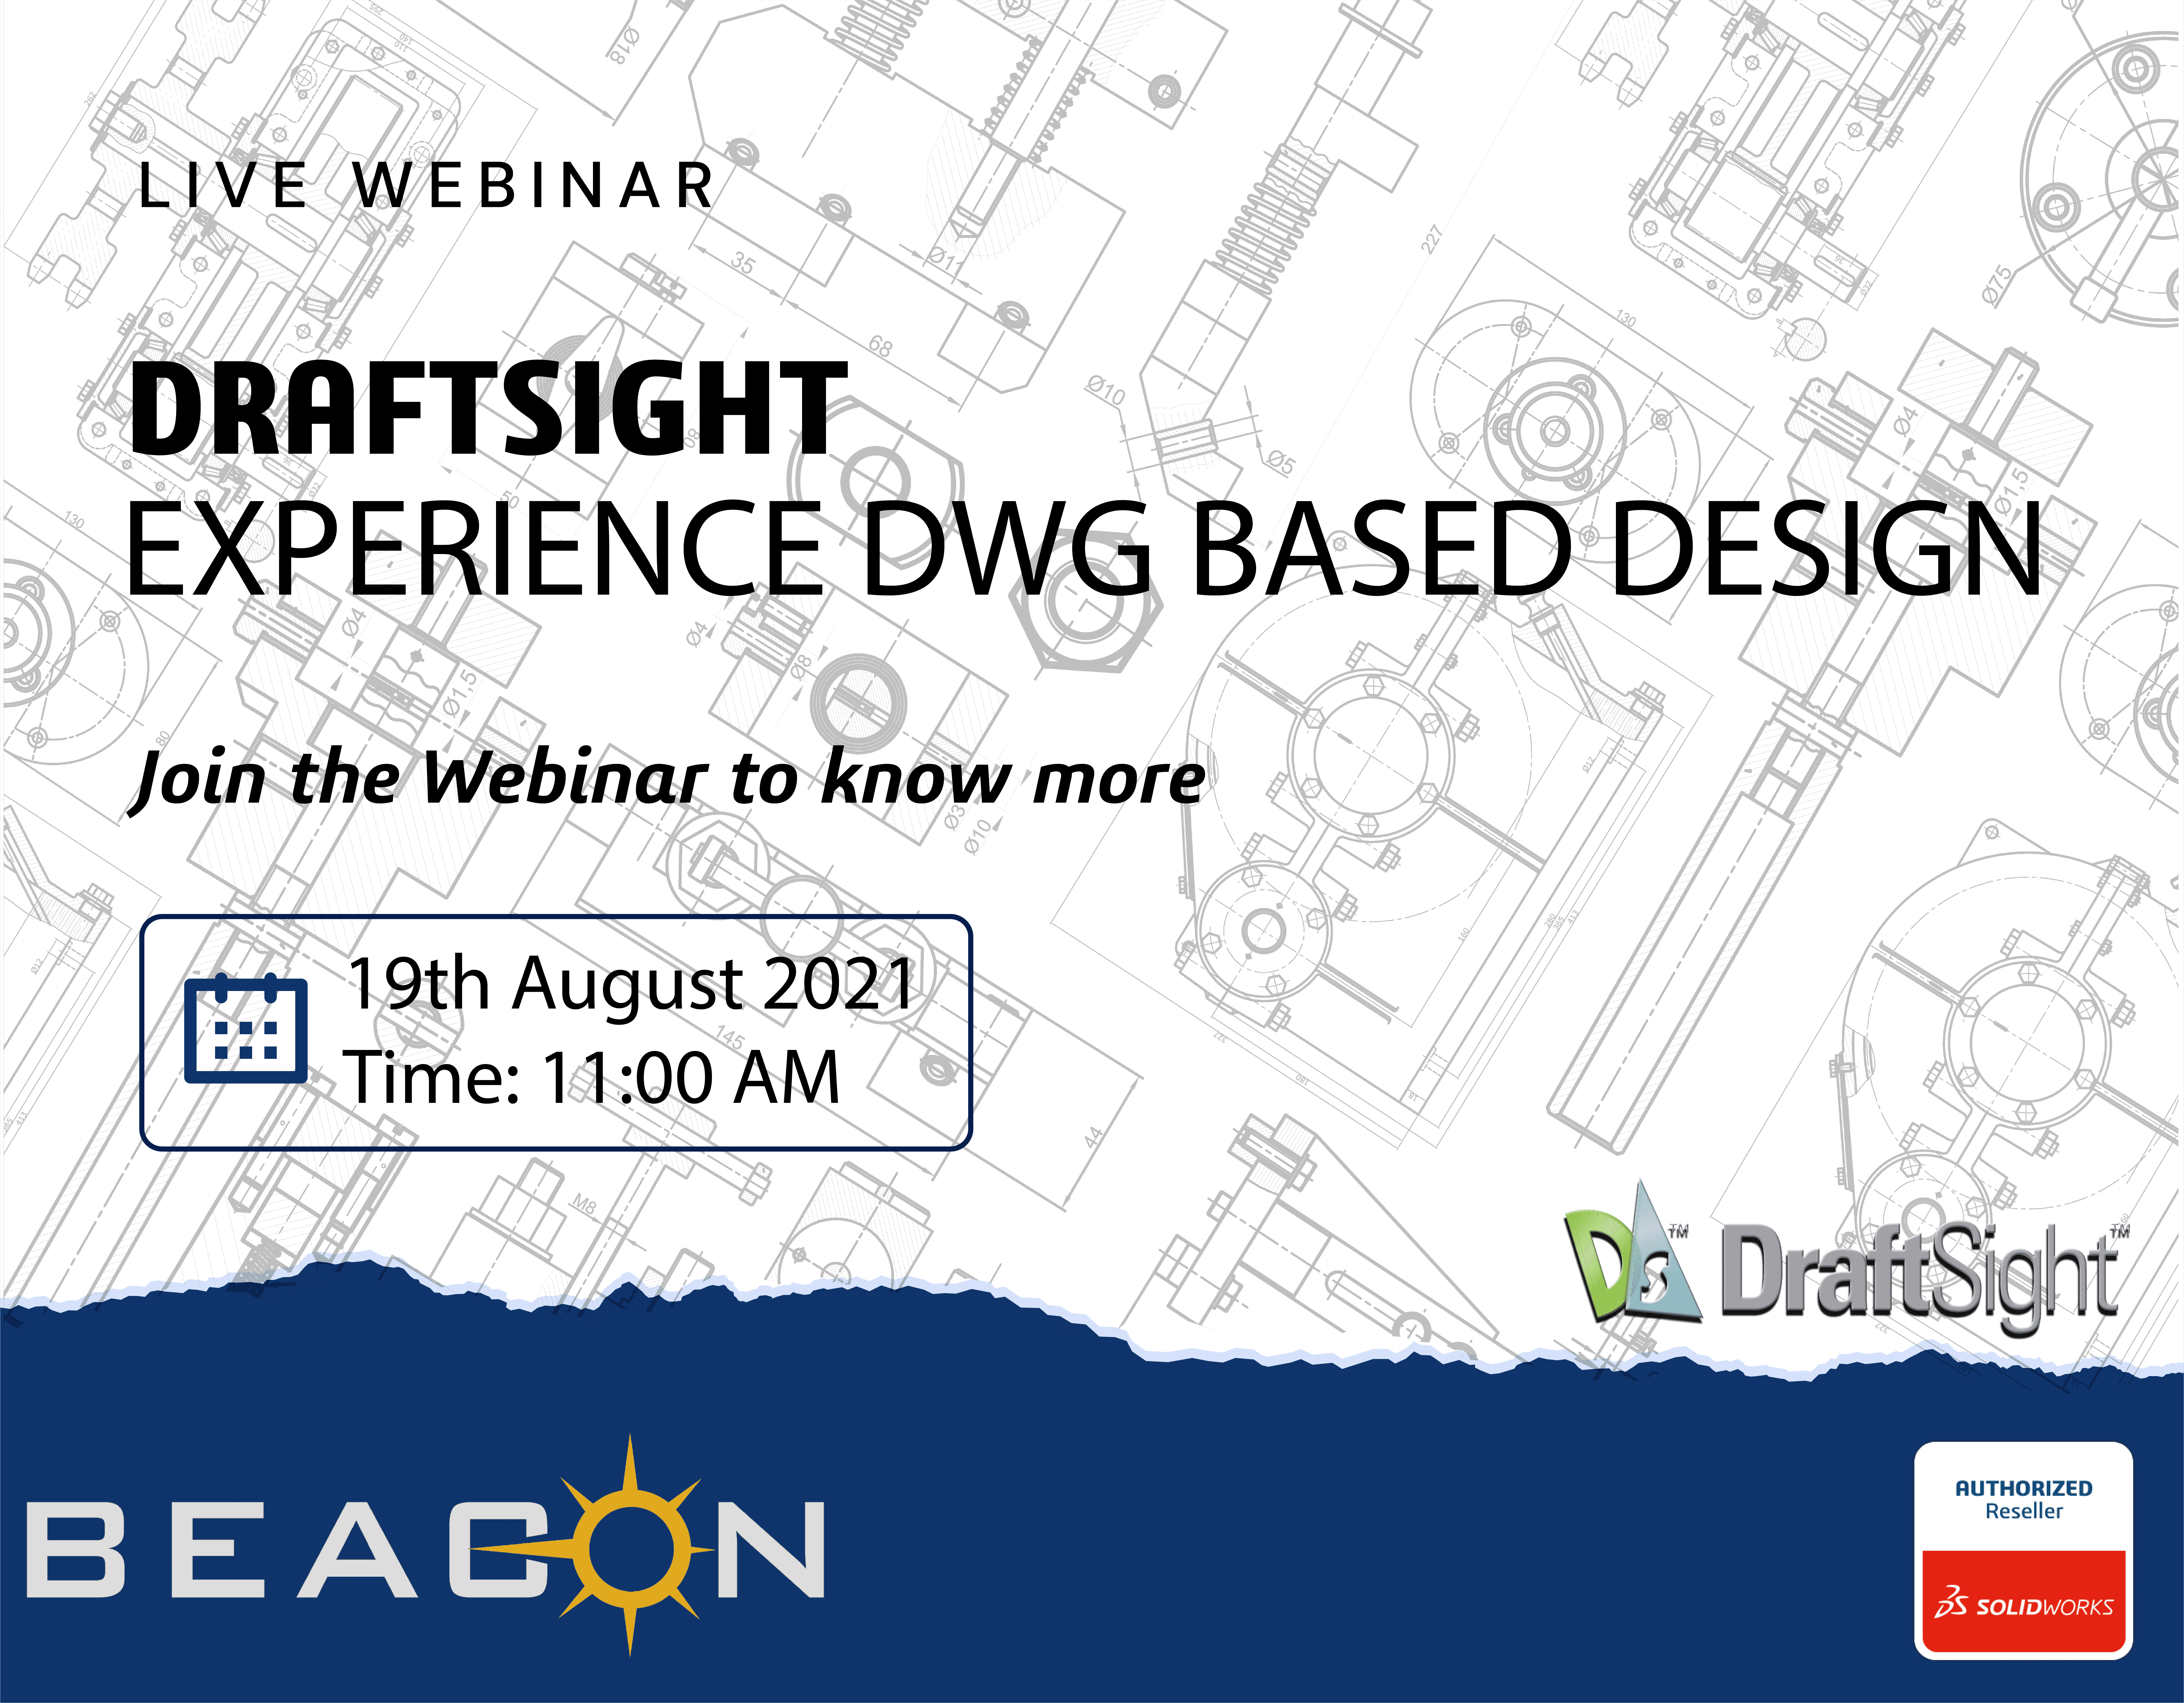 DRAFTSIGHT - EXPERIENCE DWG BASED DESIGN